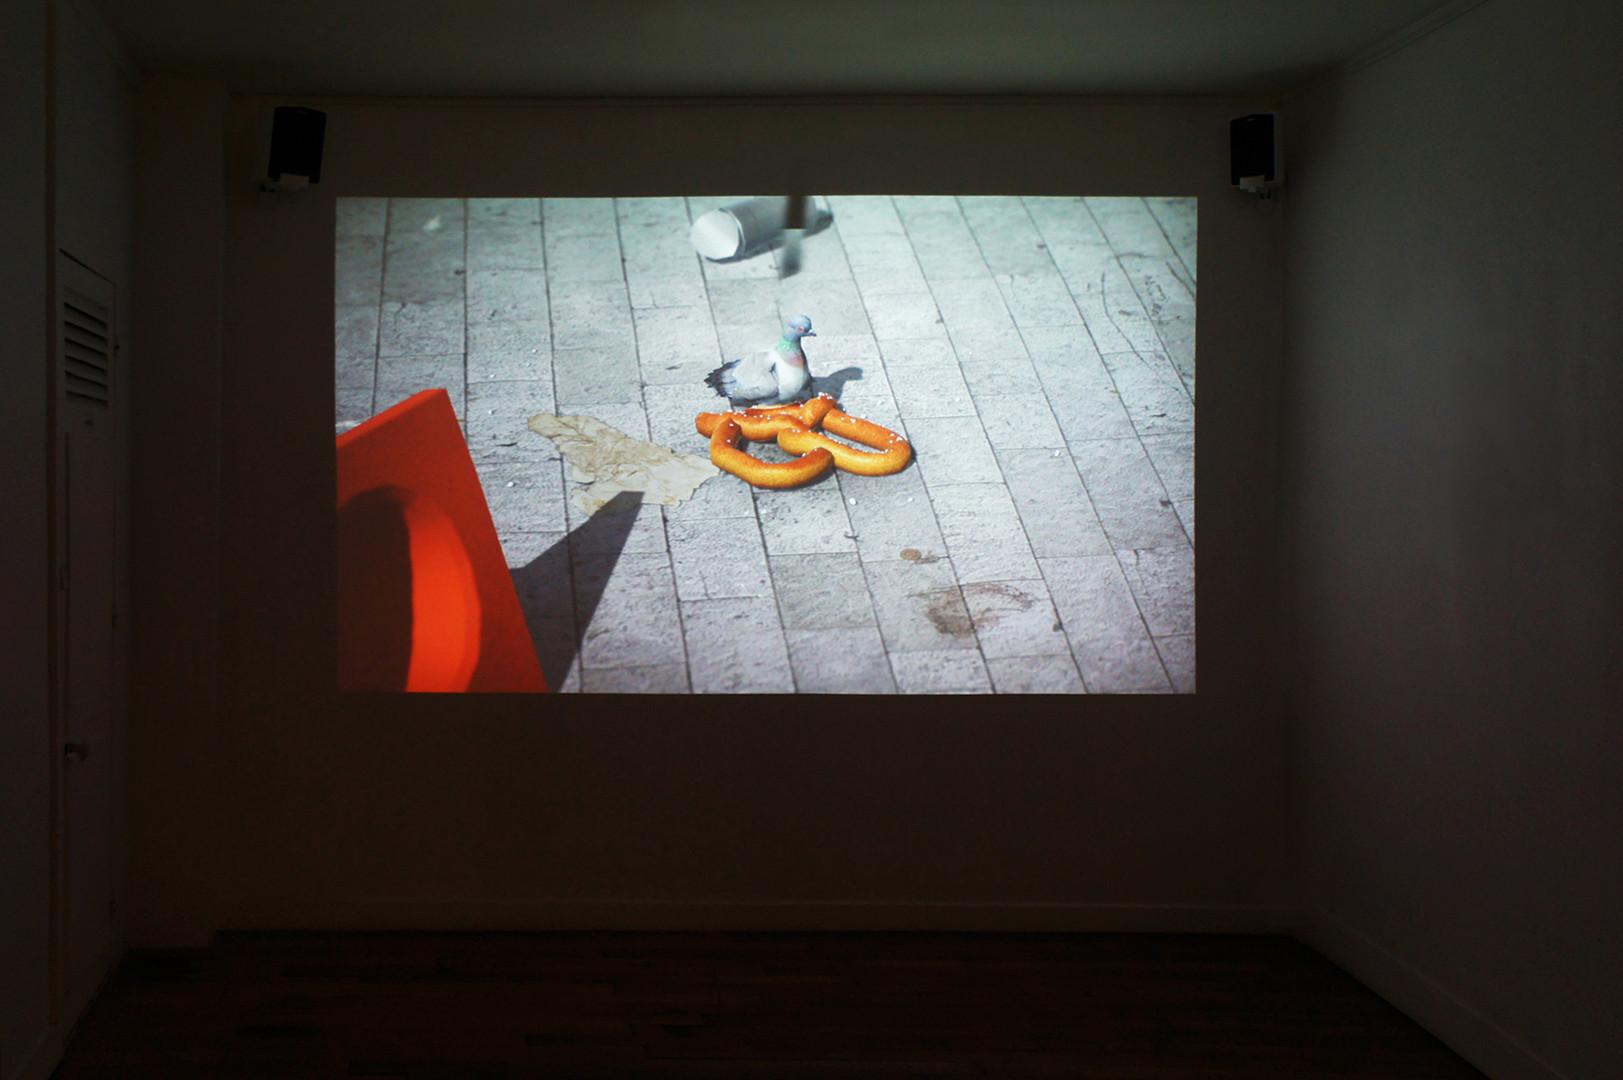 Galerie Julien Cadet Theo Triantafyllidis Réalisme d'aujourd'hui